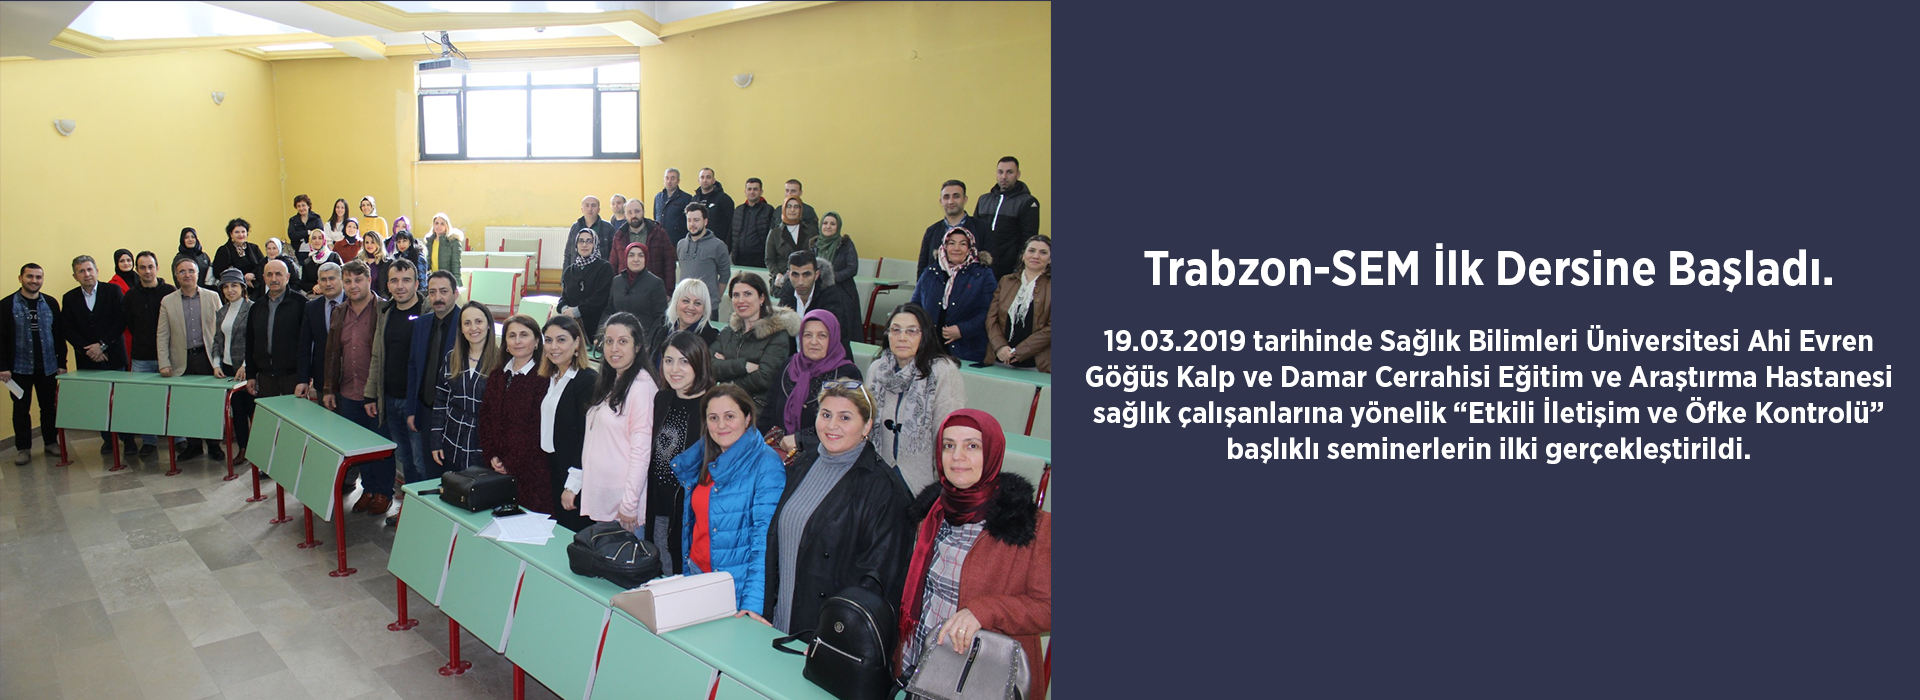 Trabzon-SEM İlk Ders